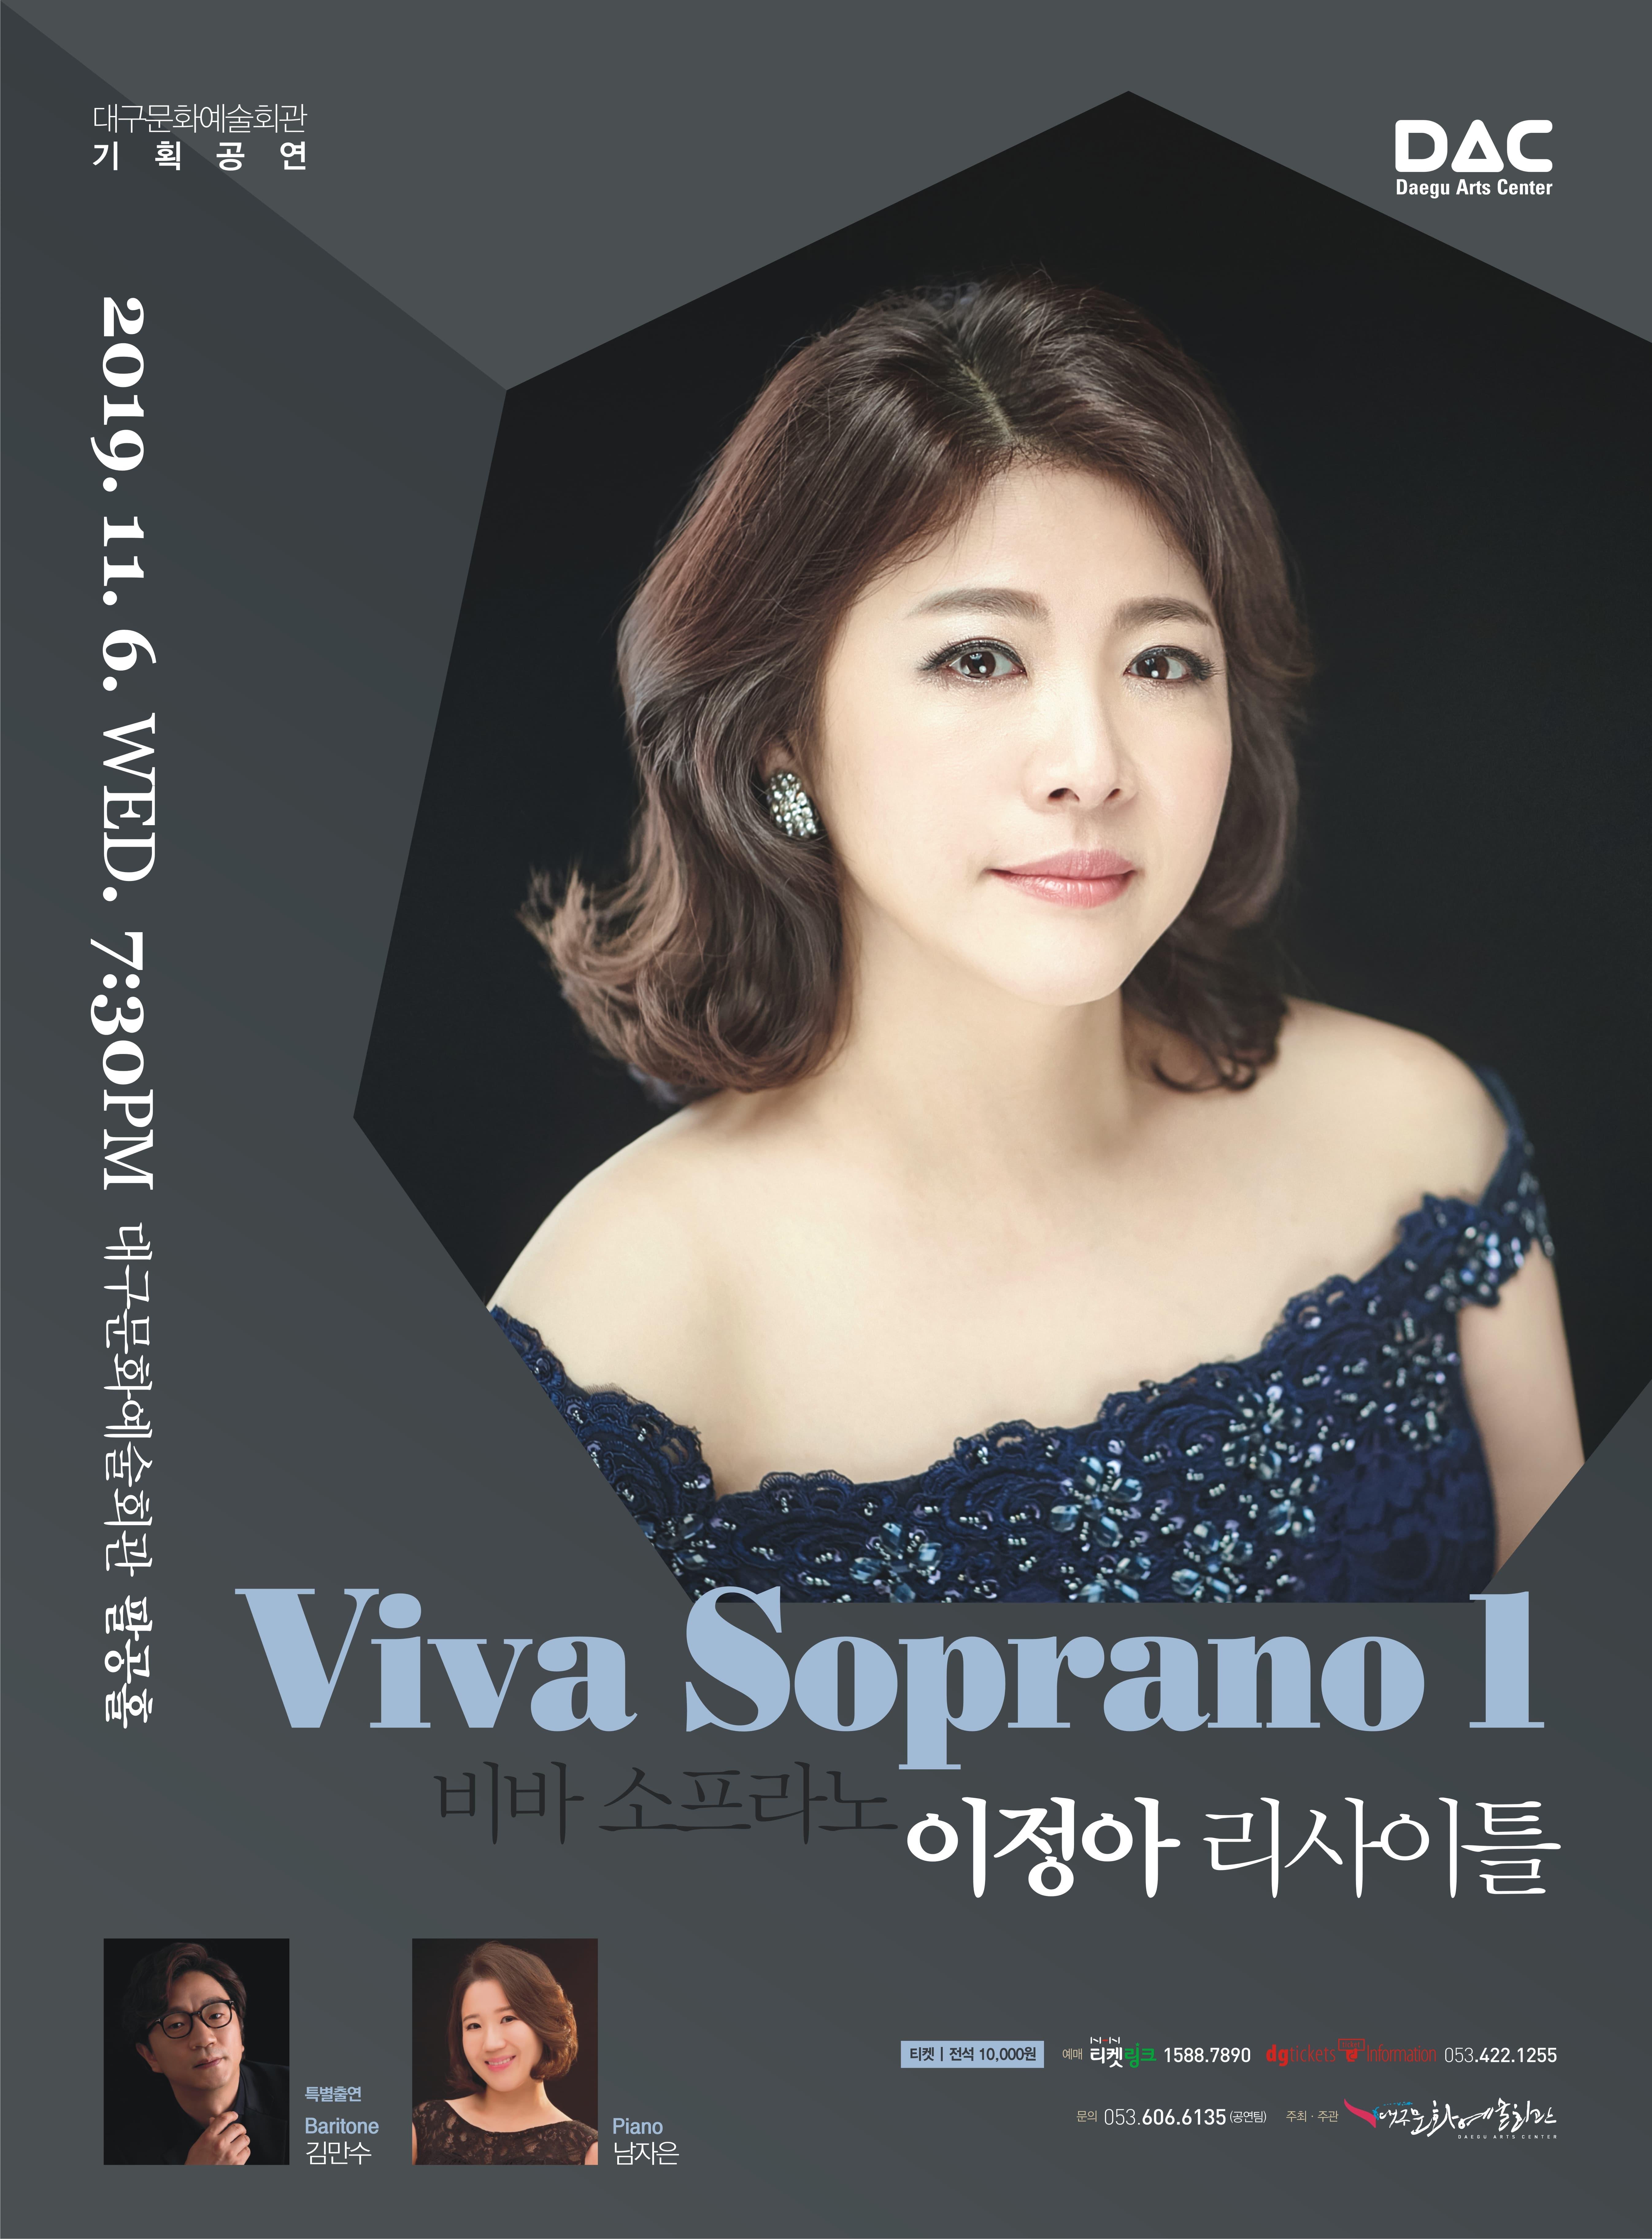 Viva Soprano1 - 이정아 리사이틀